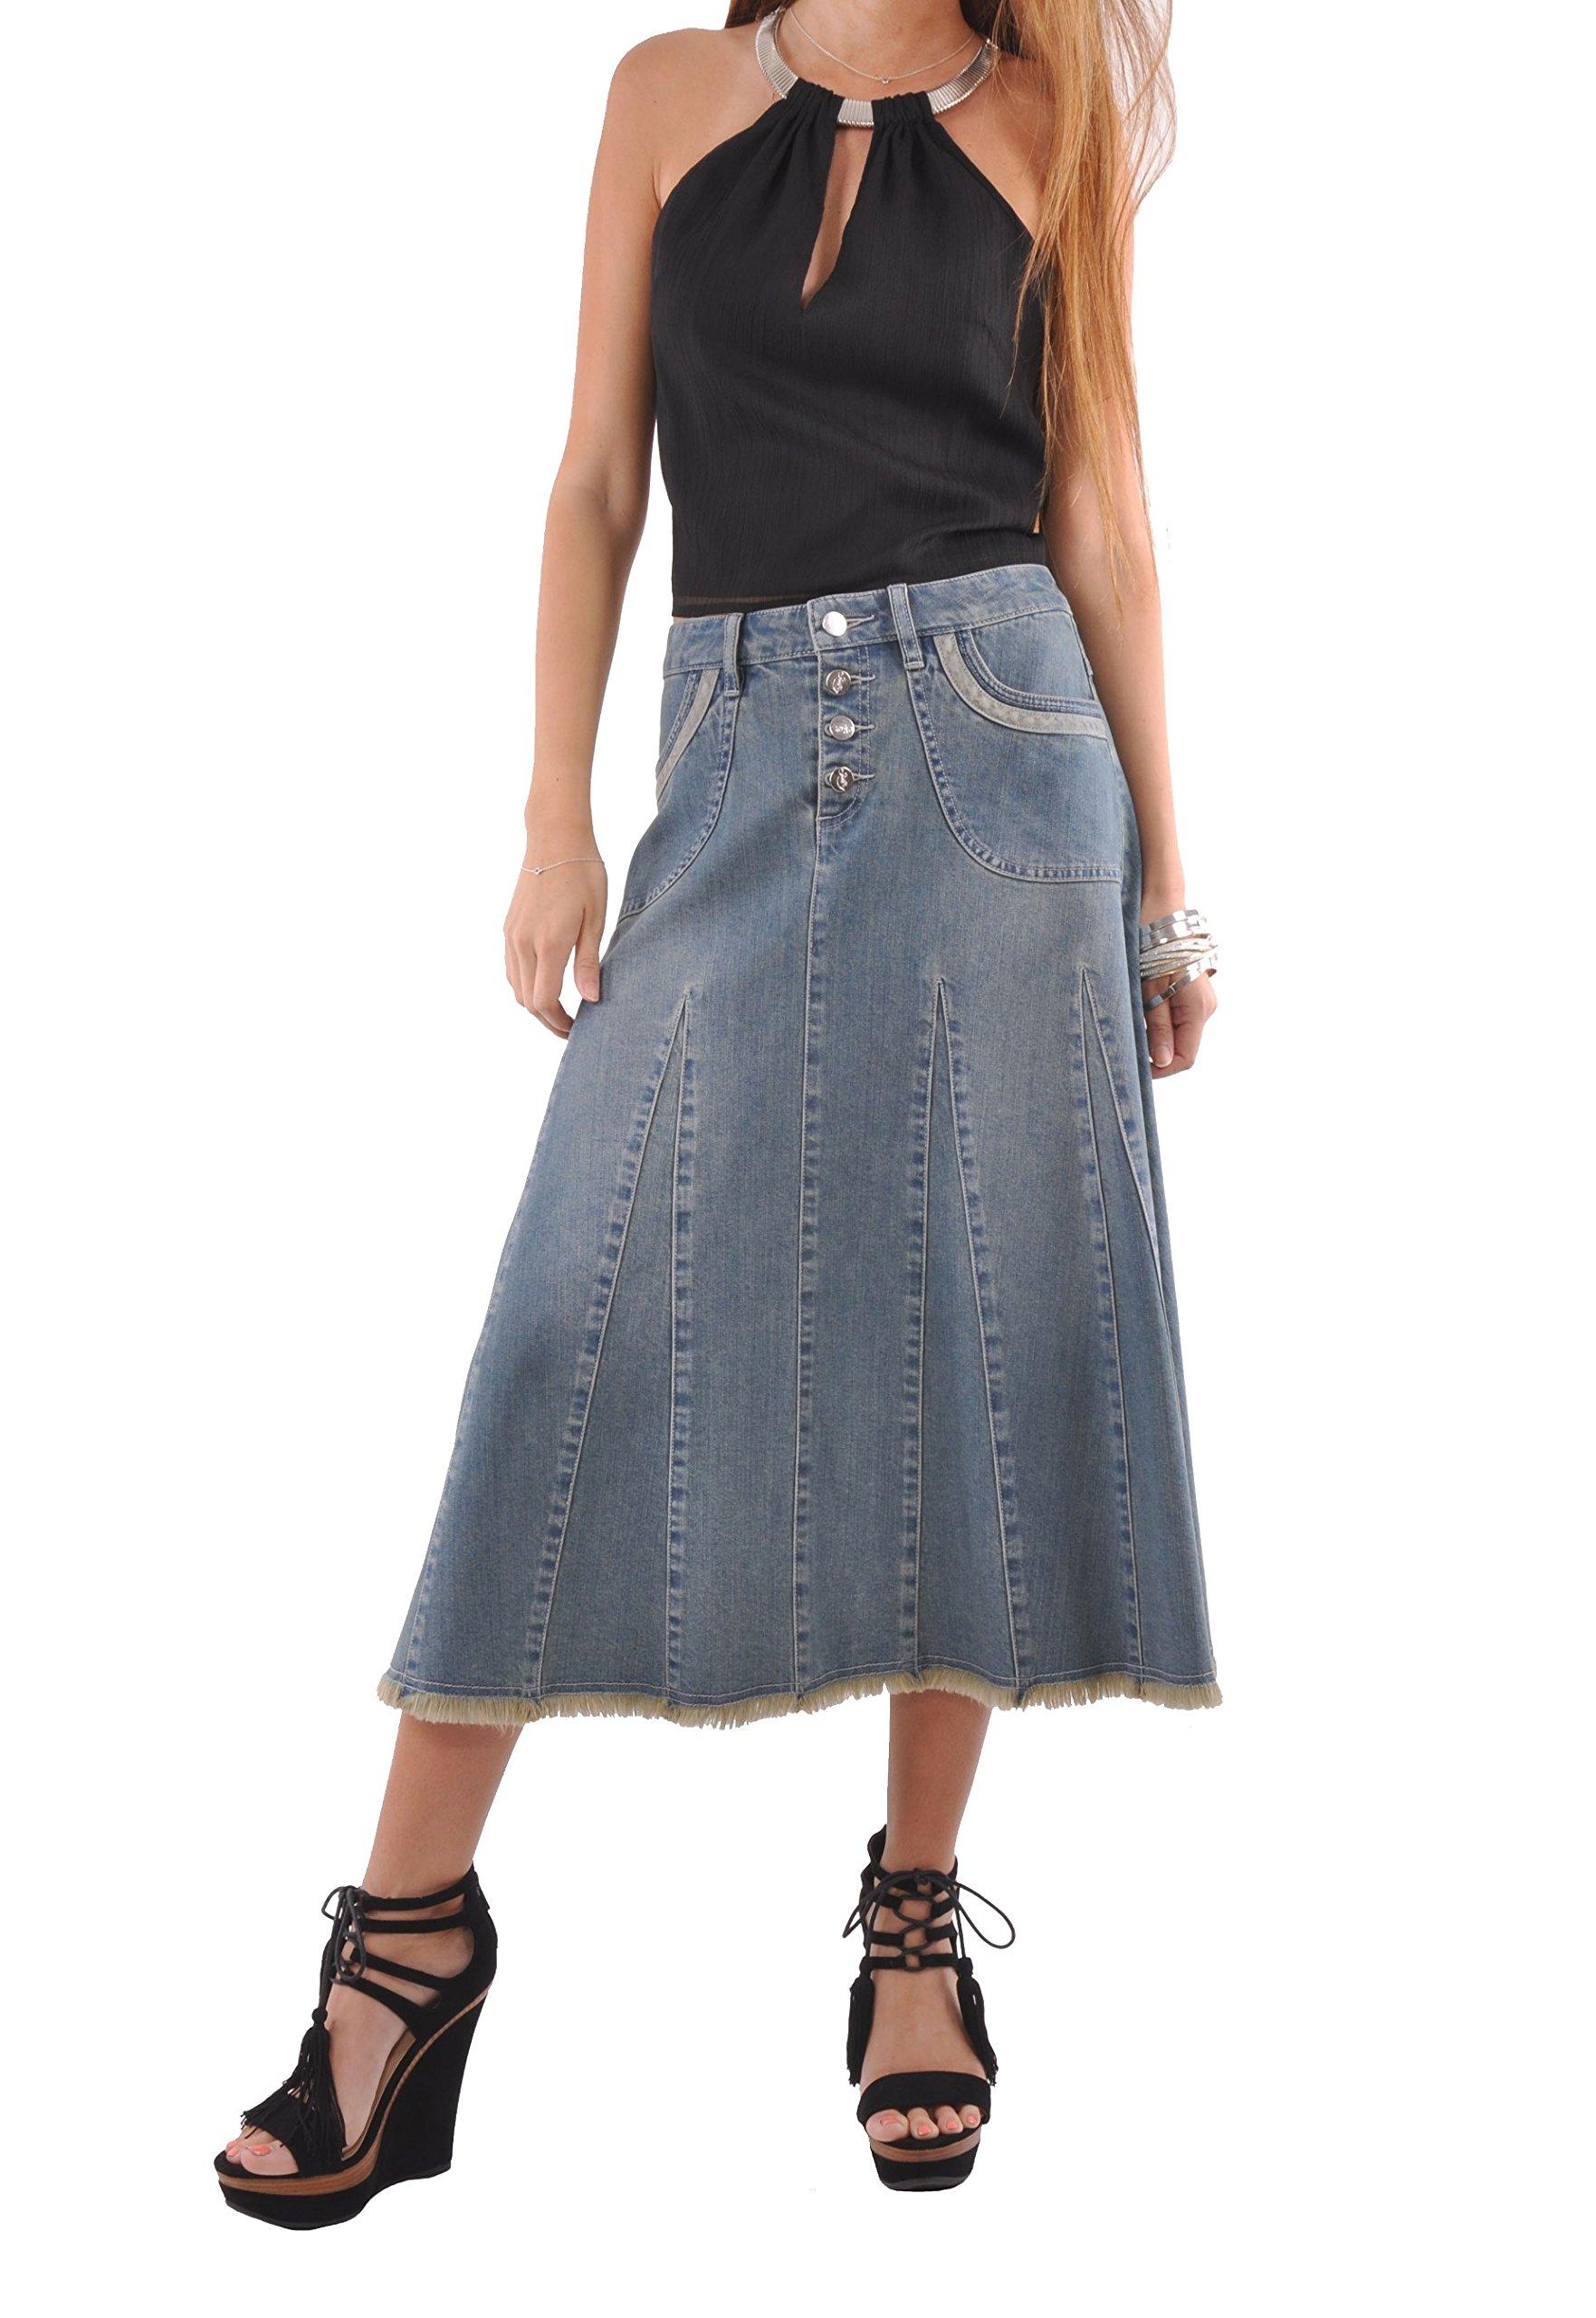 Style J Lady Grace Denim Skirt-Blue-26(6)